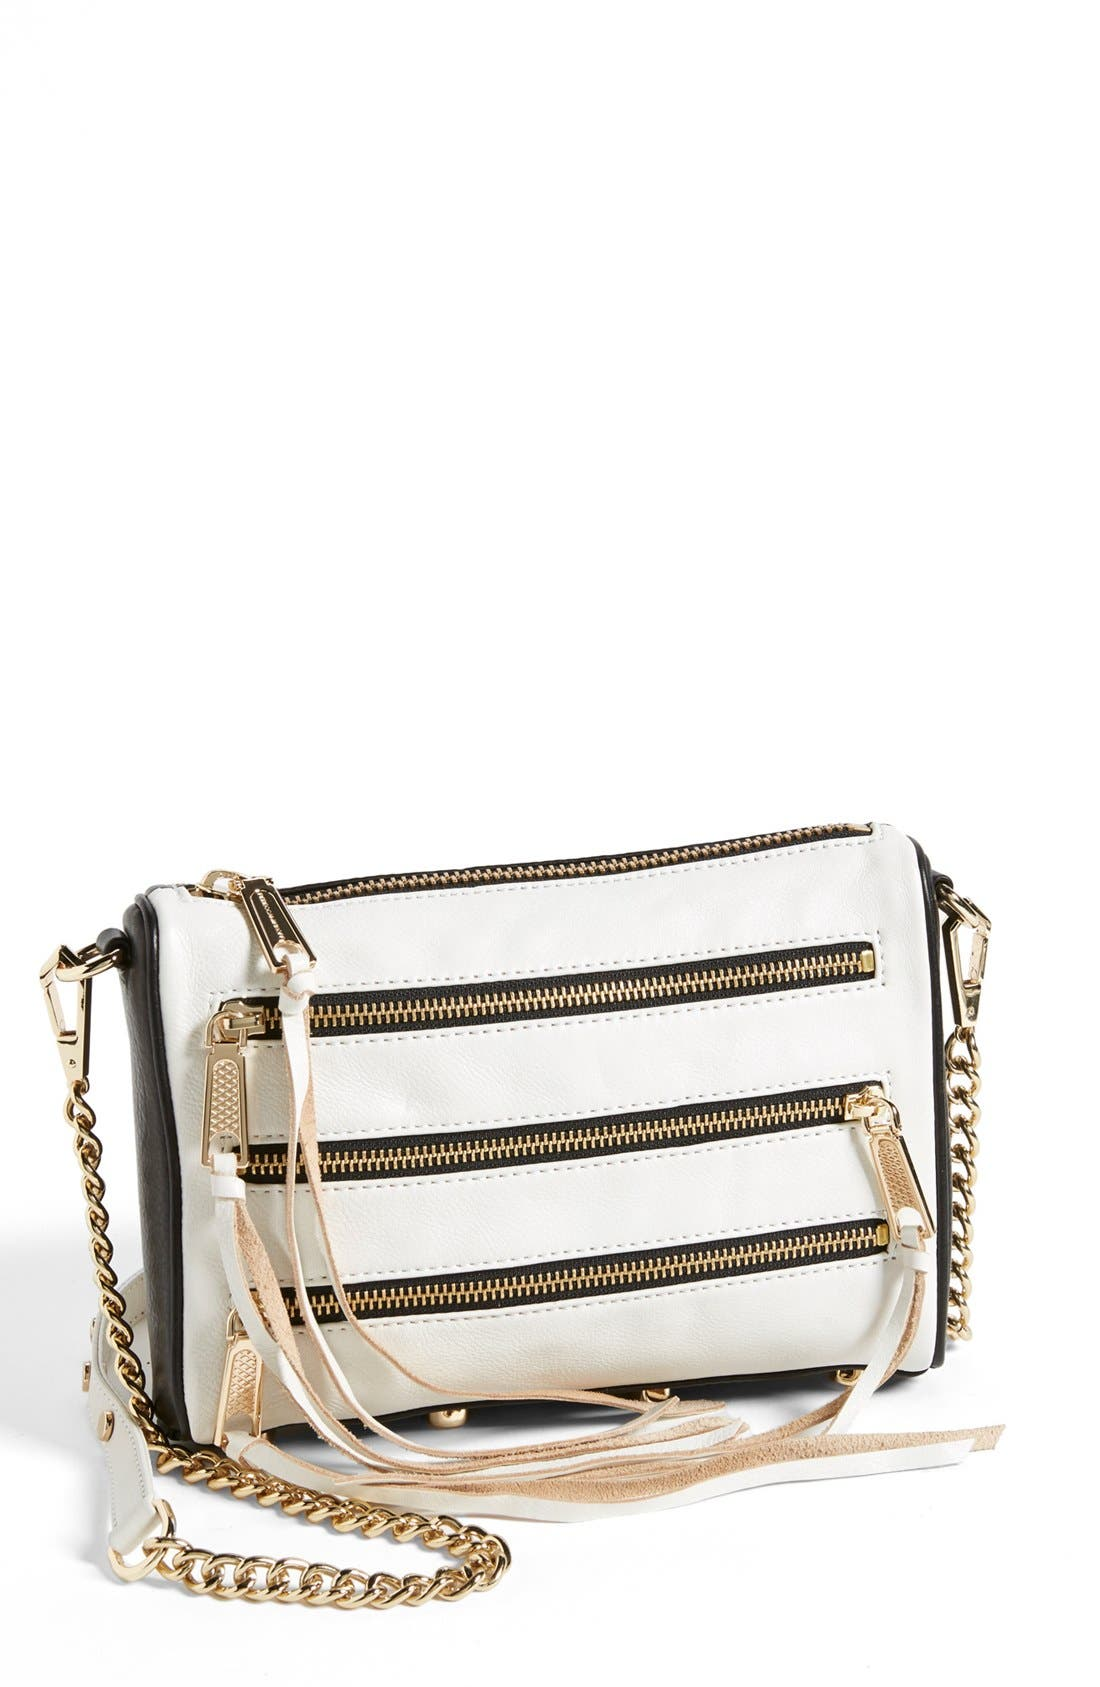 Main Image - Rebecca Minkoff '5 Zip - Mini' Two-Tone Leather Crossbody Bag